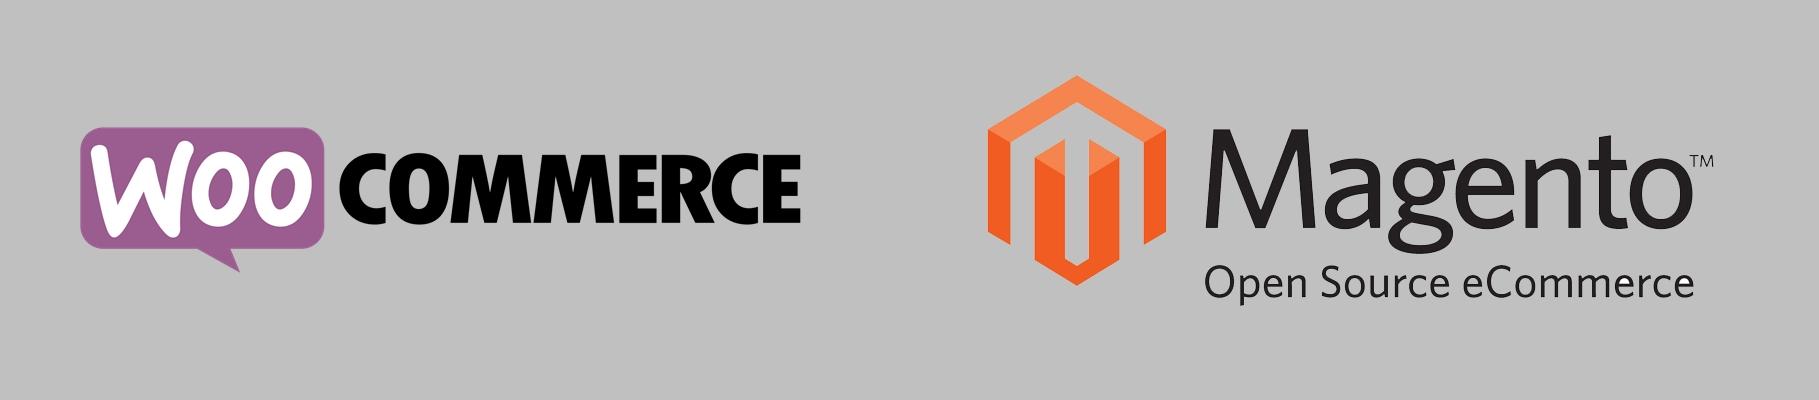 Self-Hosted e-commerce platform